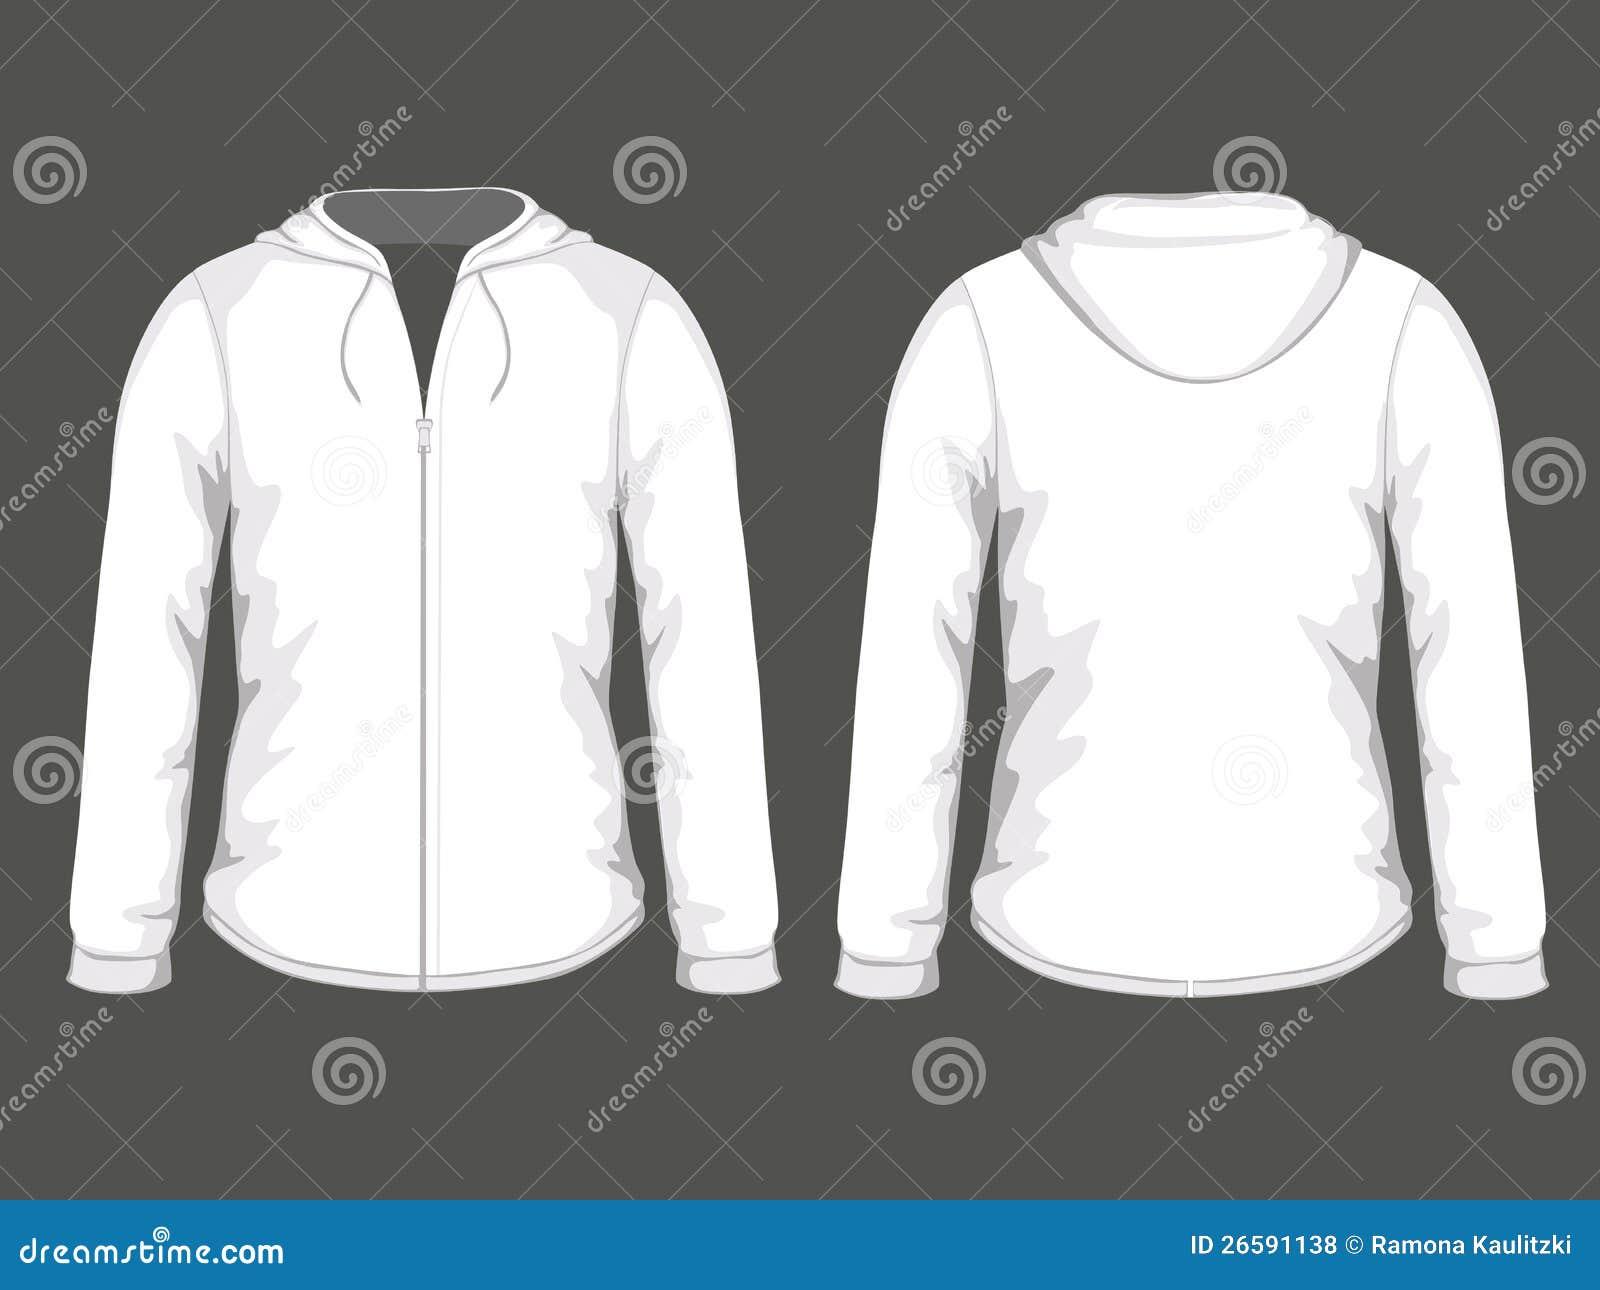 Jacket clip art  Etsy